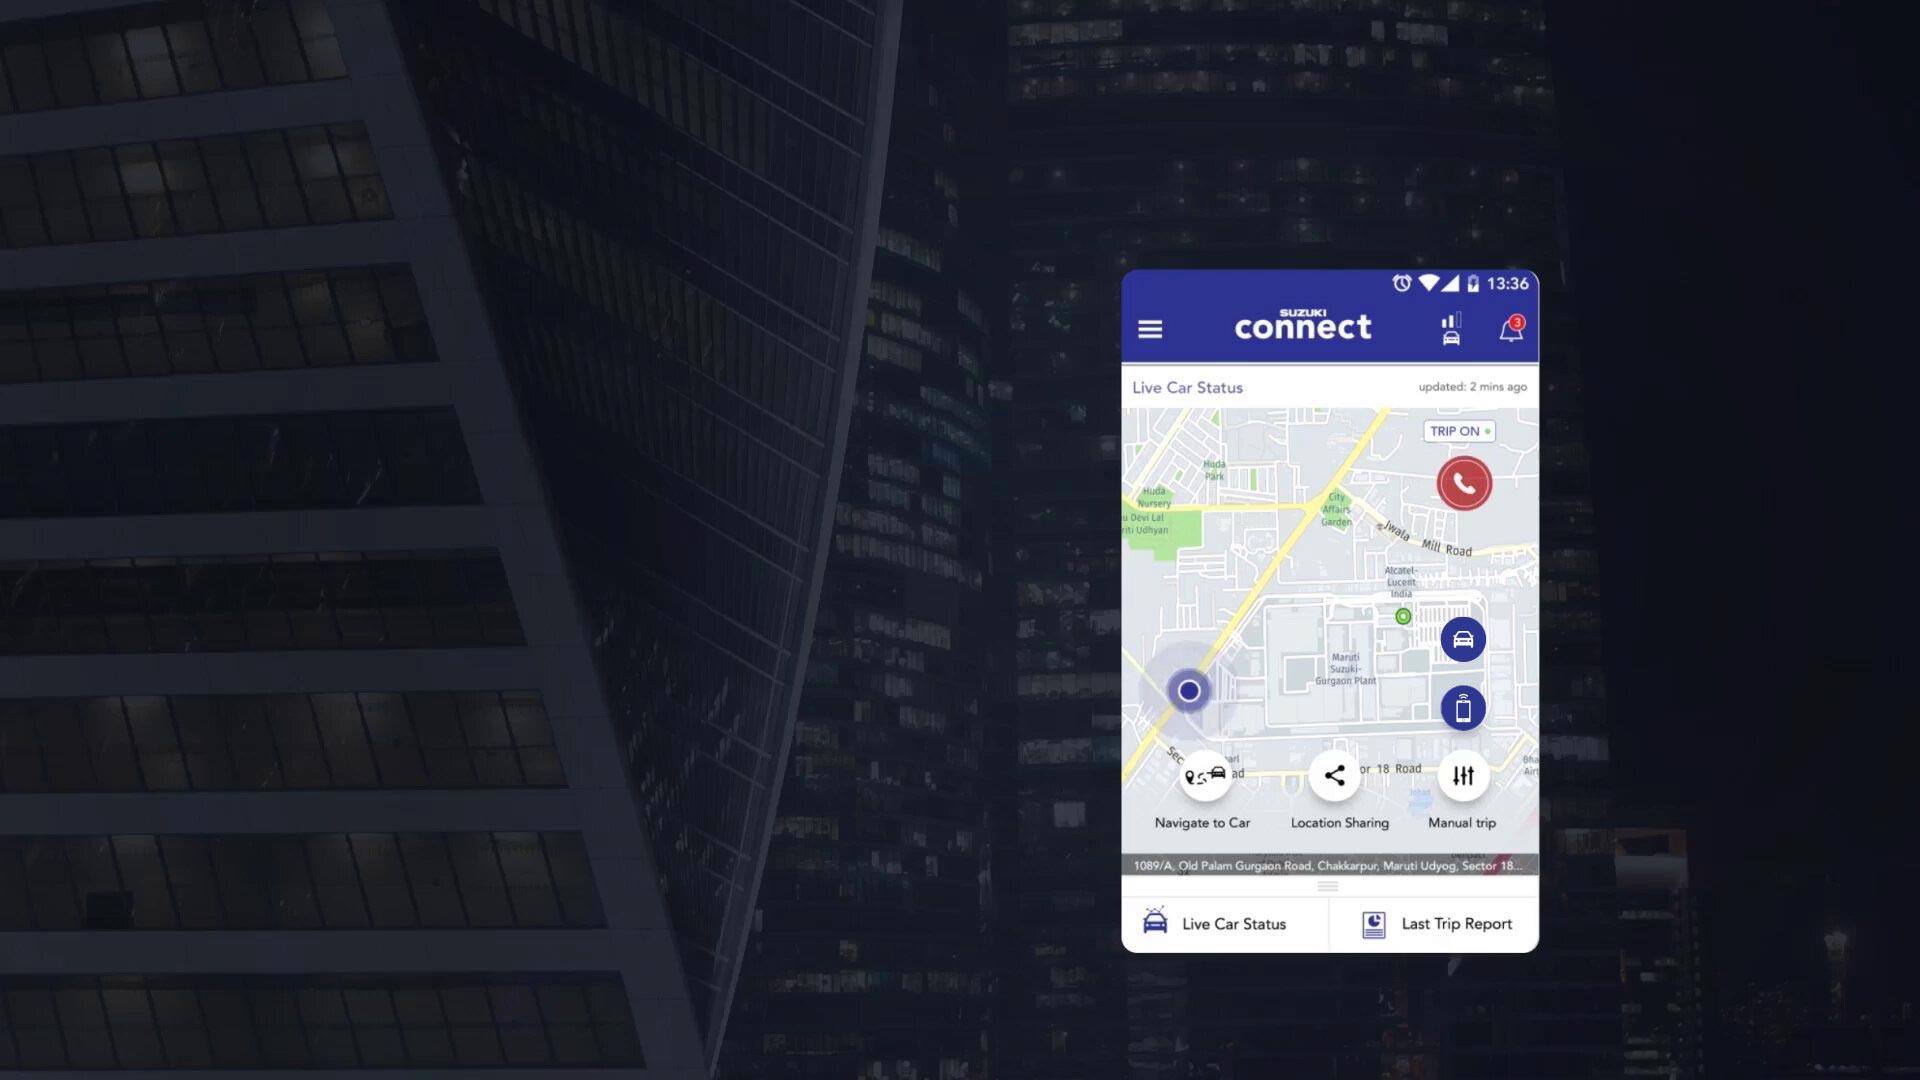 Suzuki Connect: Advanced Telematics Solutions from NEXA